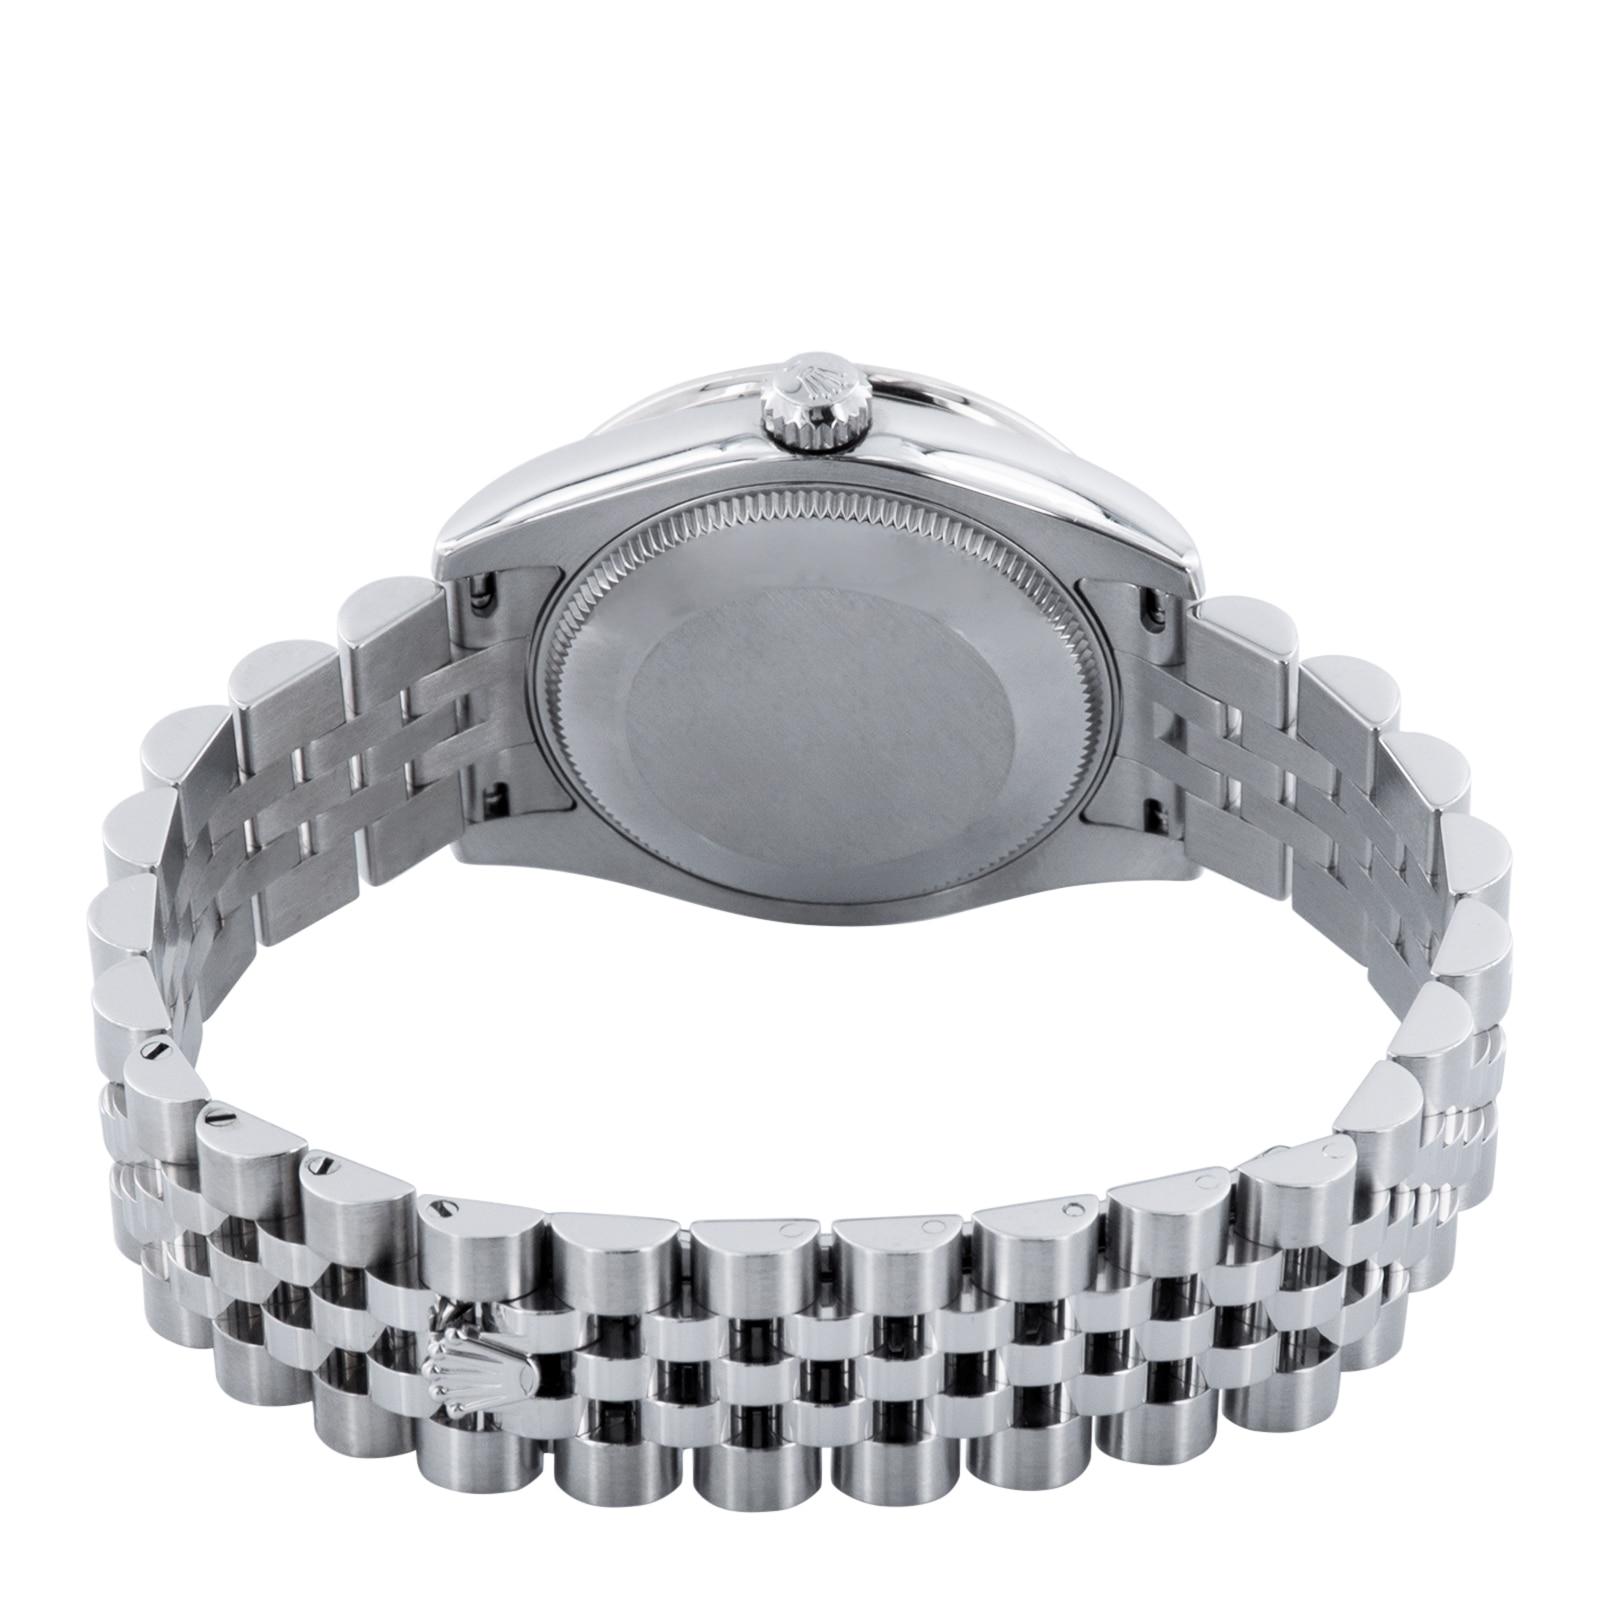 Rolex Pre-Owned Rolex Datejust Watch 178384